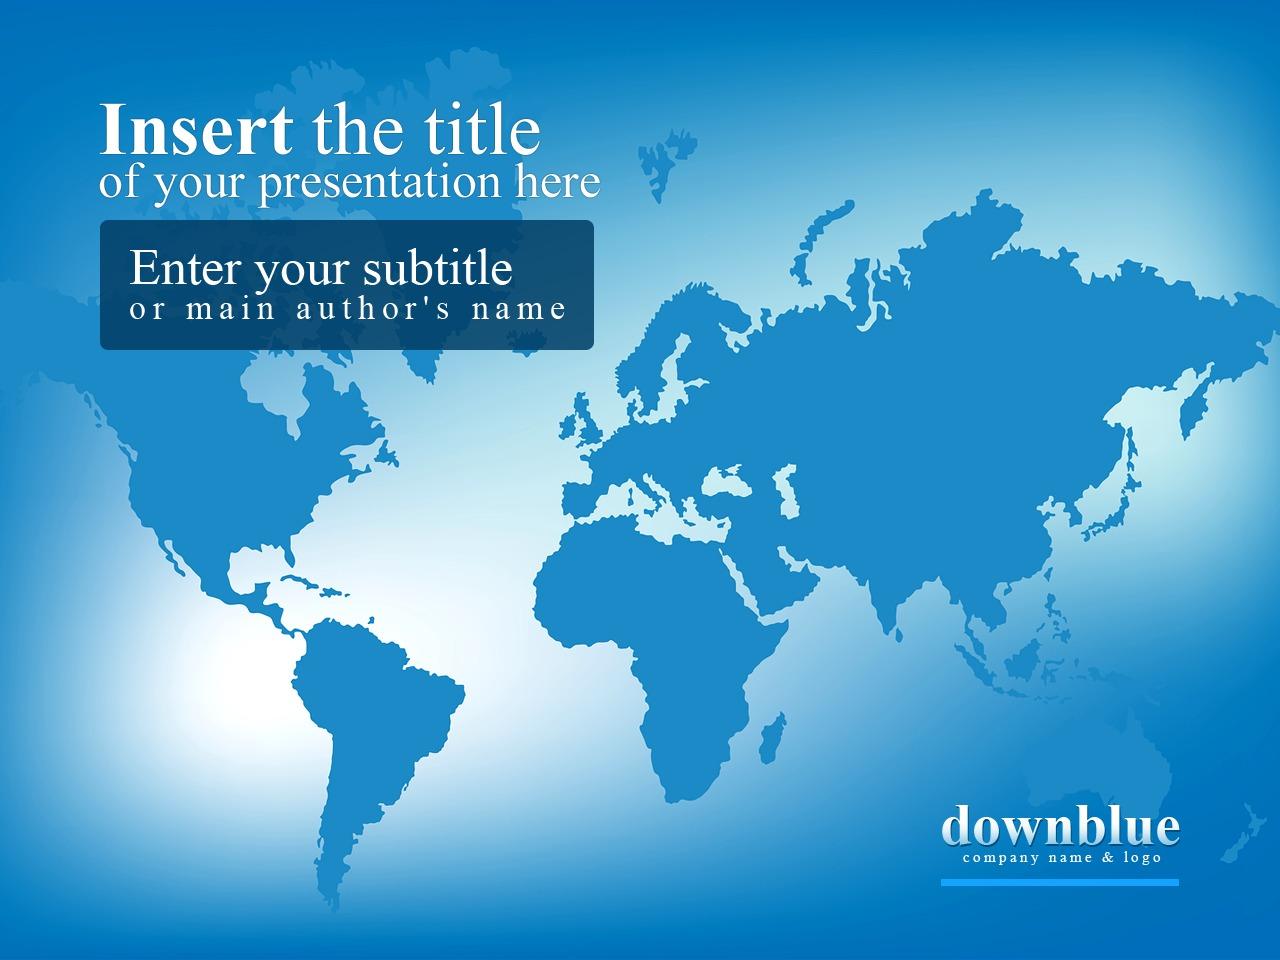 PowerPoint шаблон №24577 на тему бизнес и услуги